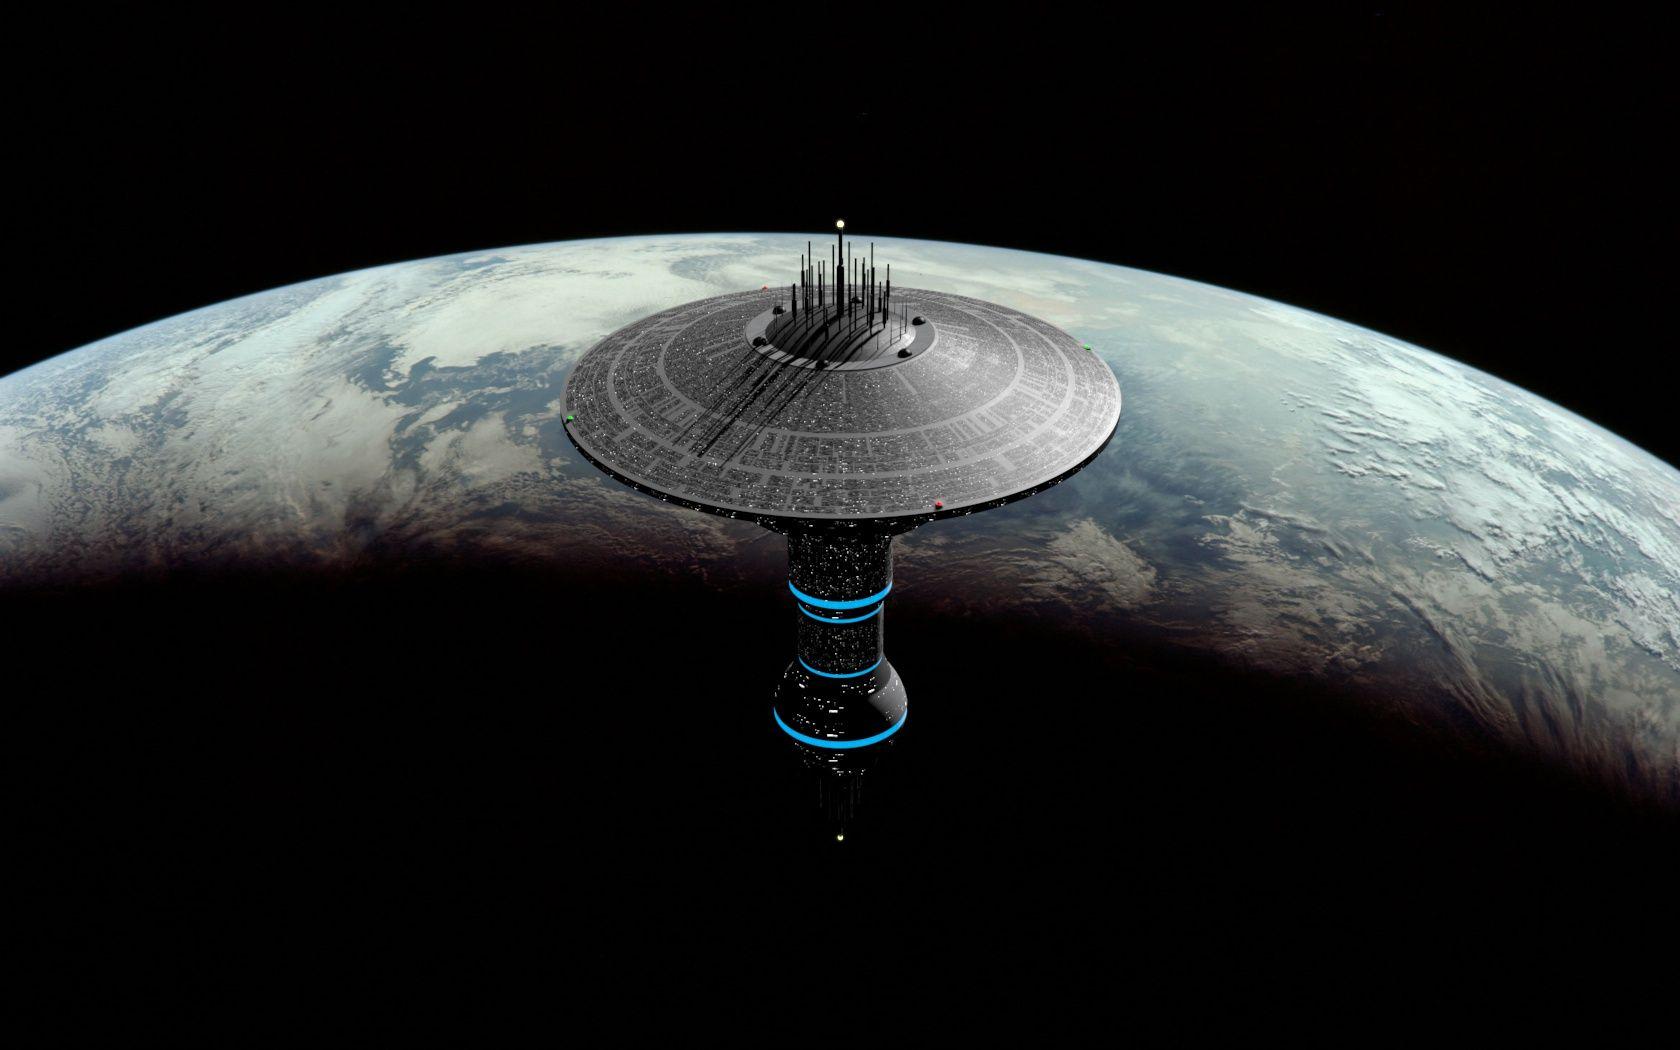 futuristic donut space station - photo #17